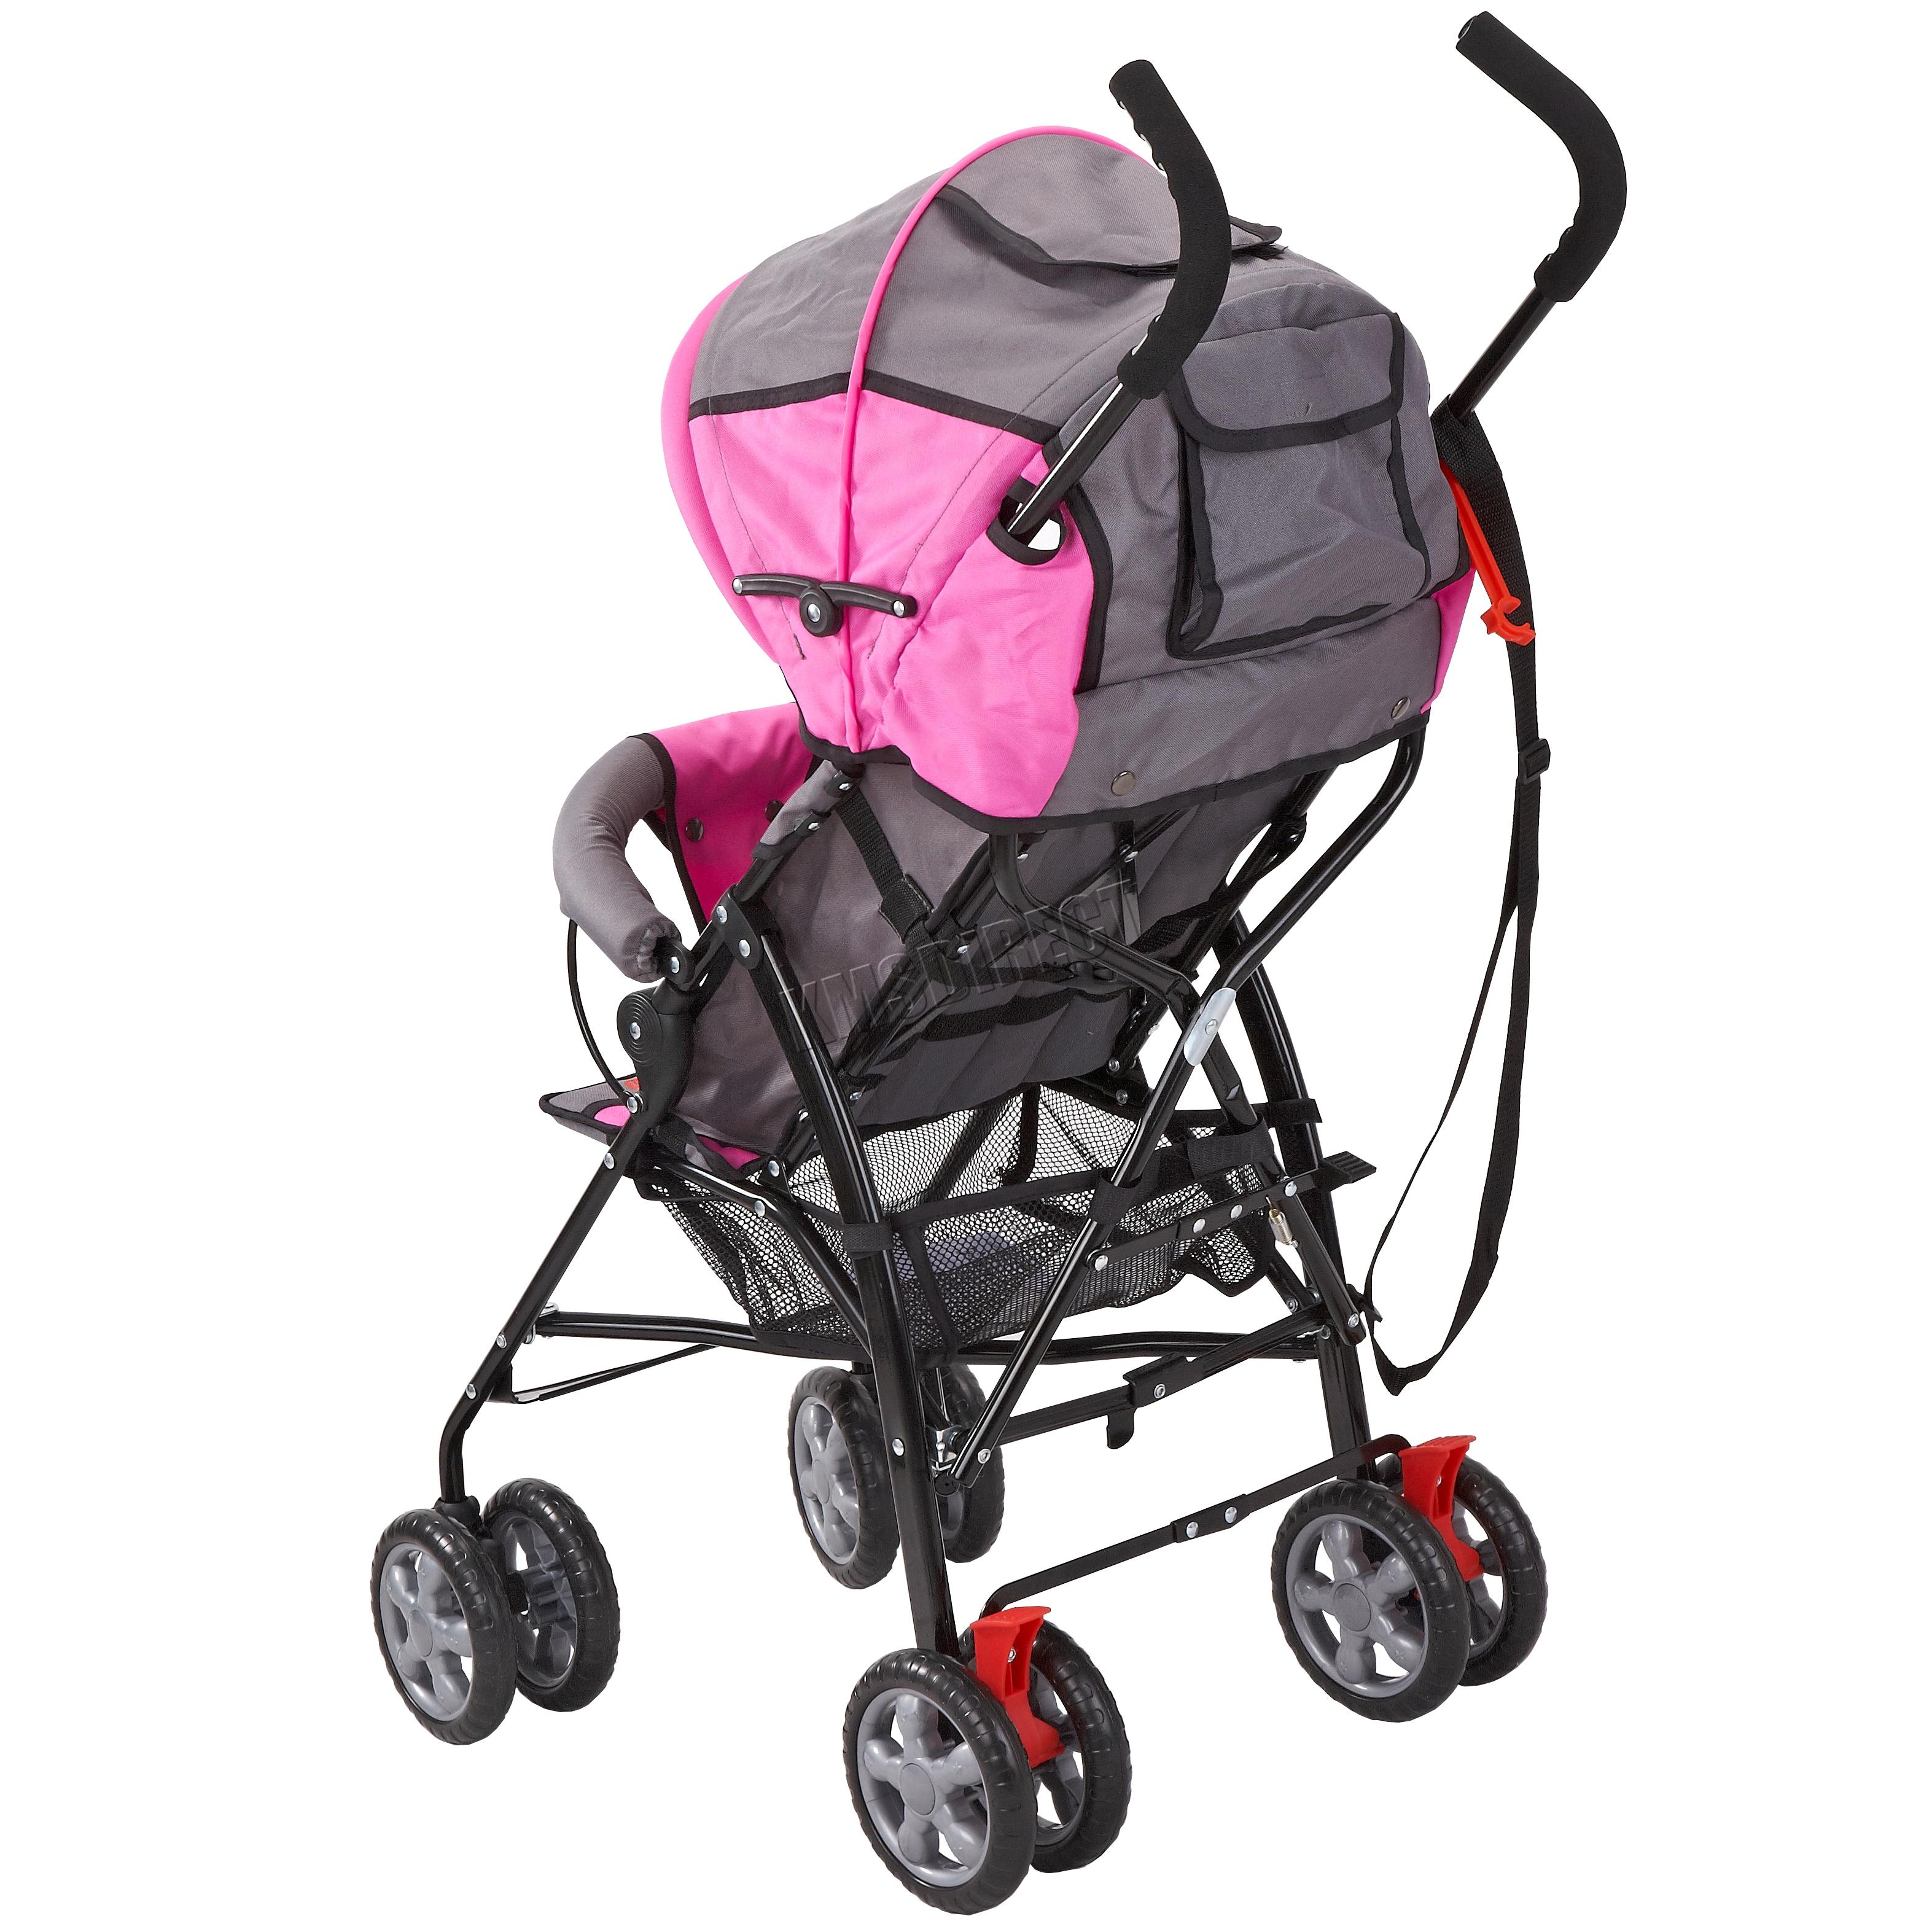 foxhunter baby infant toddler single stroller pushchair pram buggy